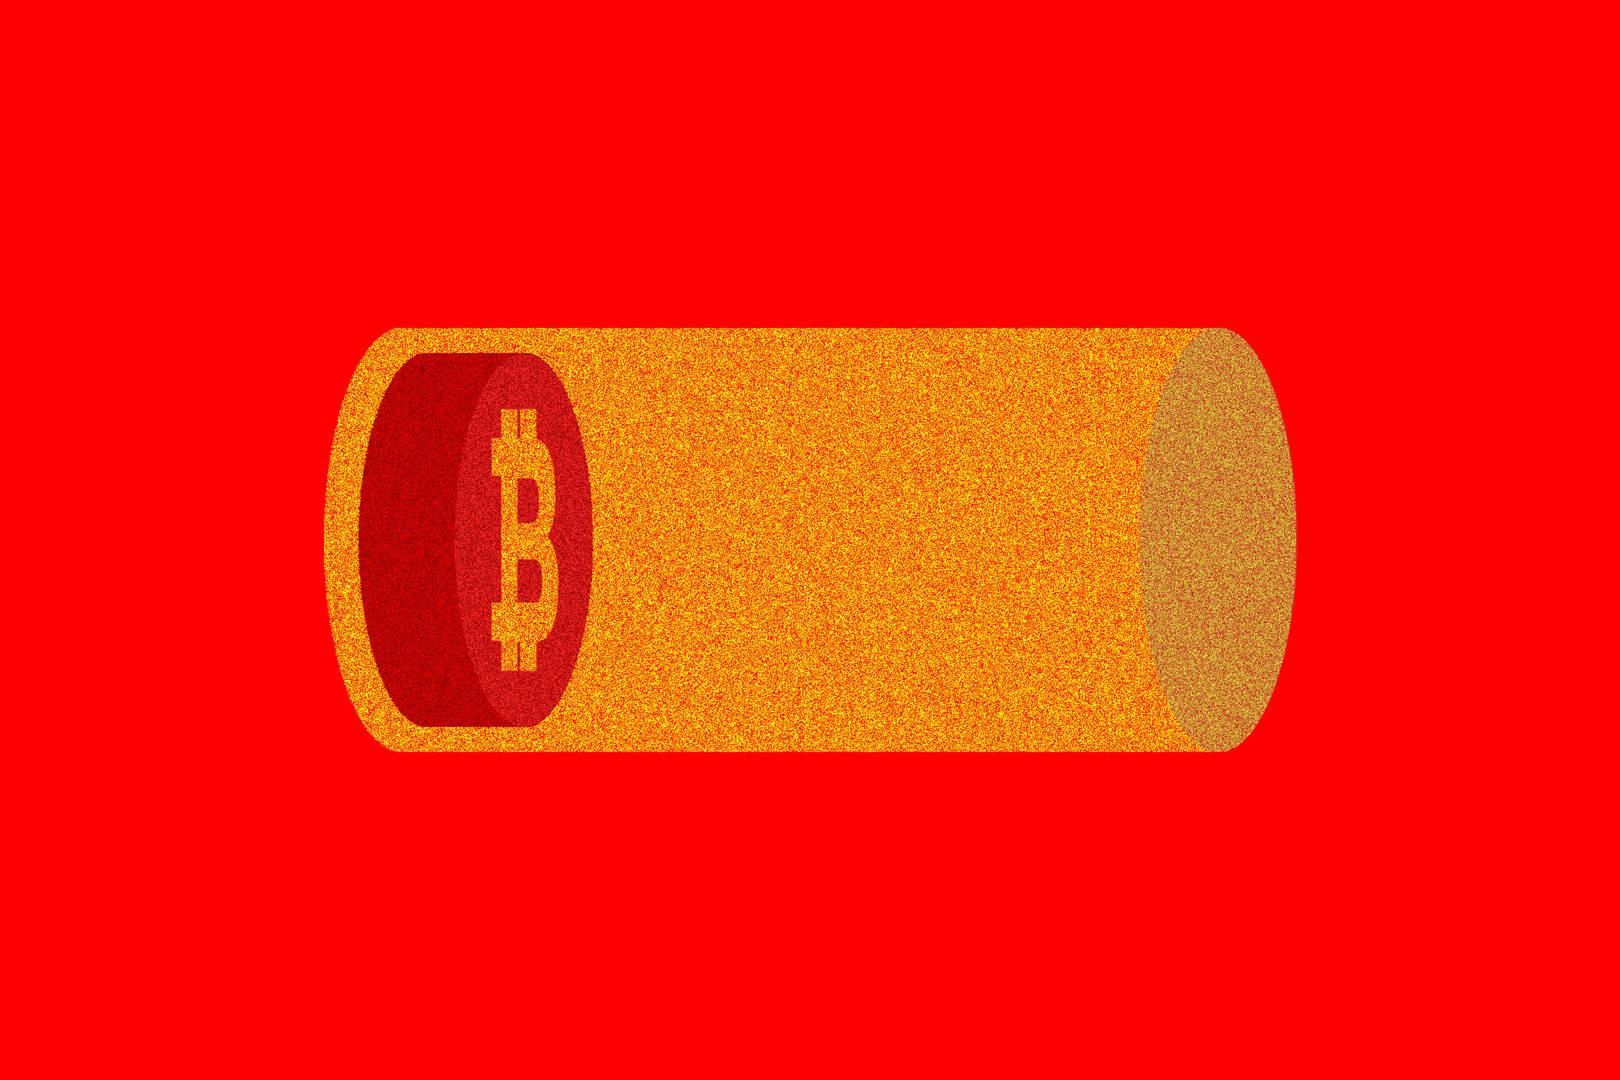 In China, bitcoin mining moguls are scrambling to survive